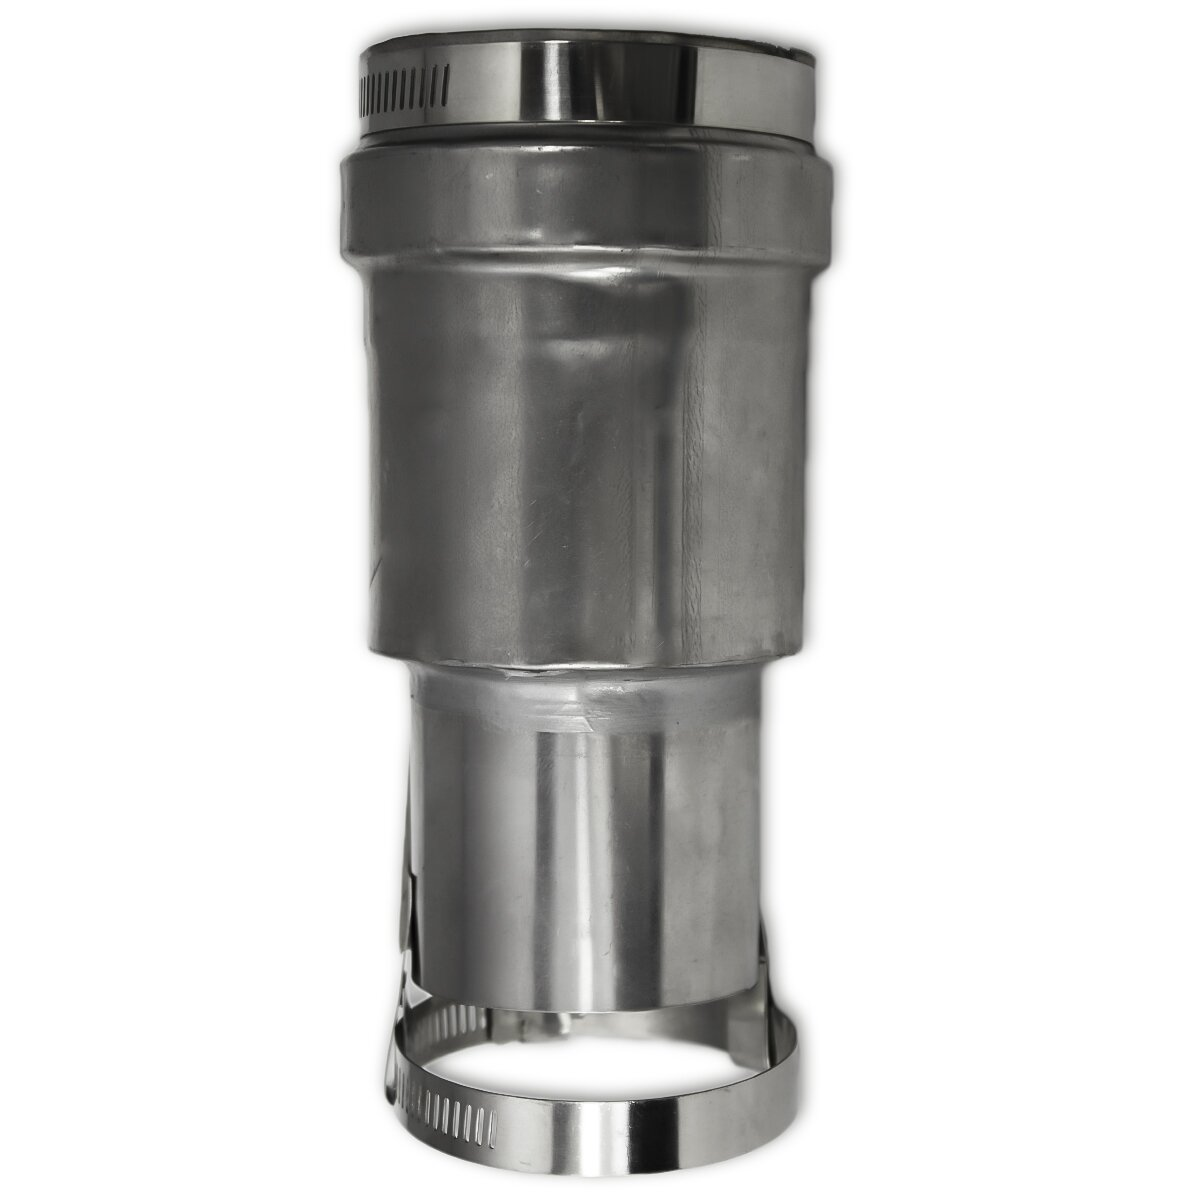 Eccotemp 4 gpm liquid propane tankless water heater Tankless water heater for 4 bedroom house